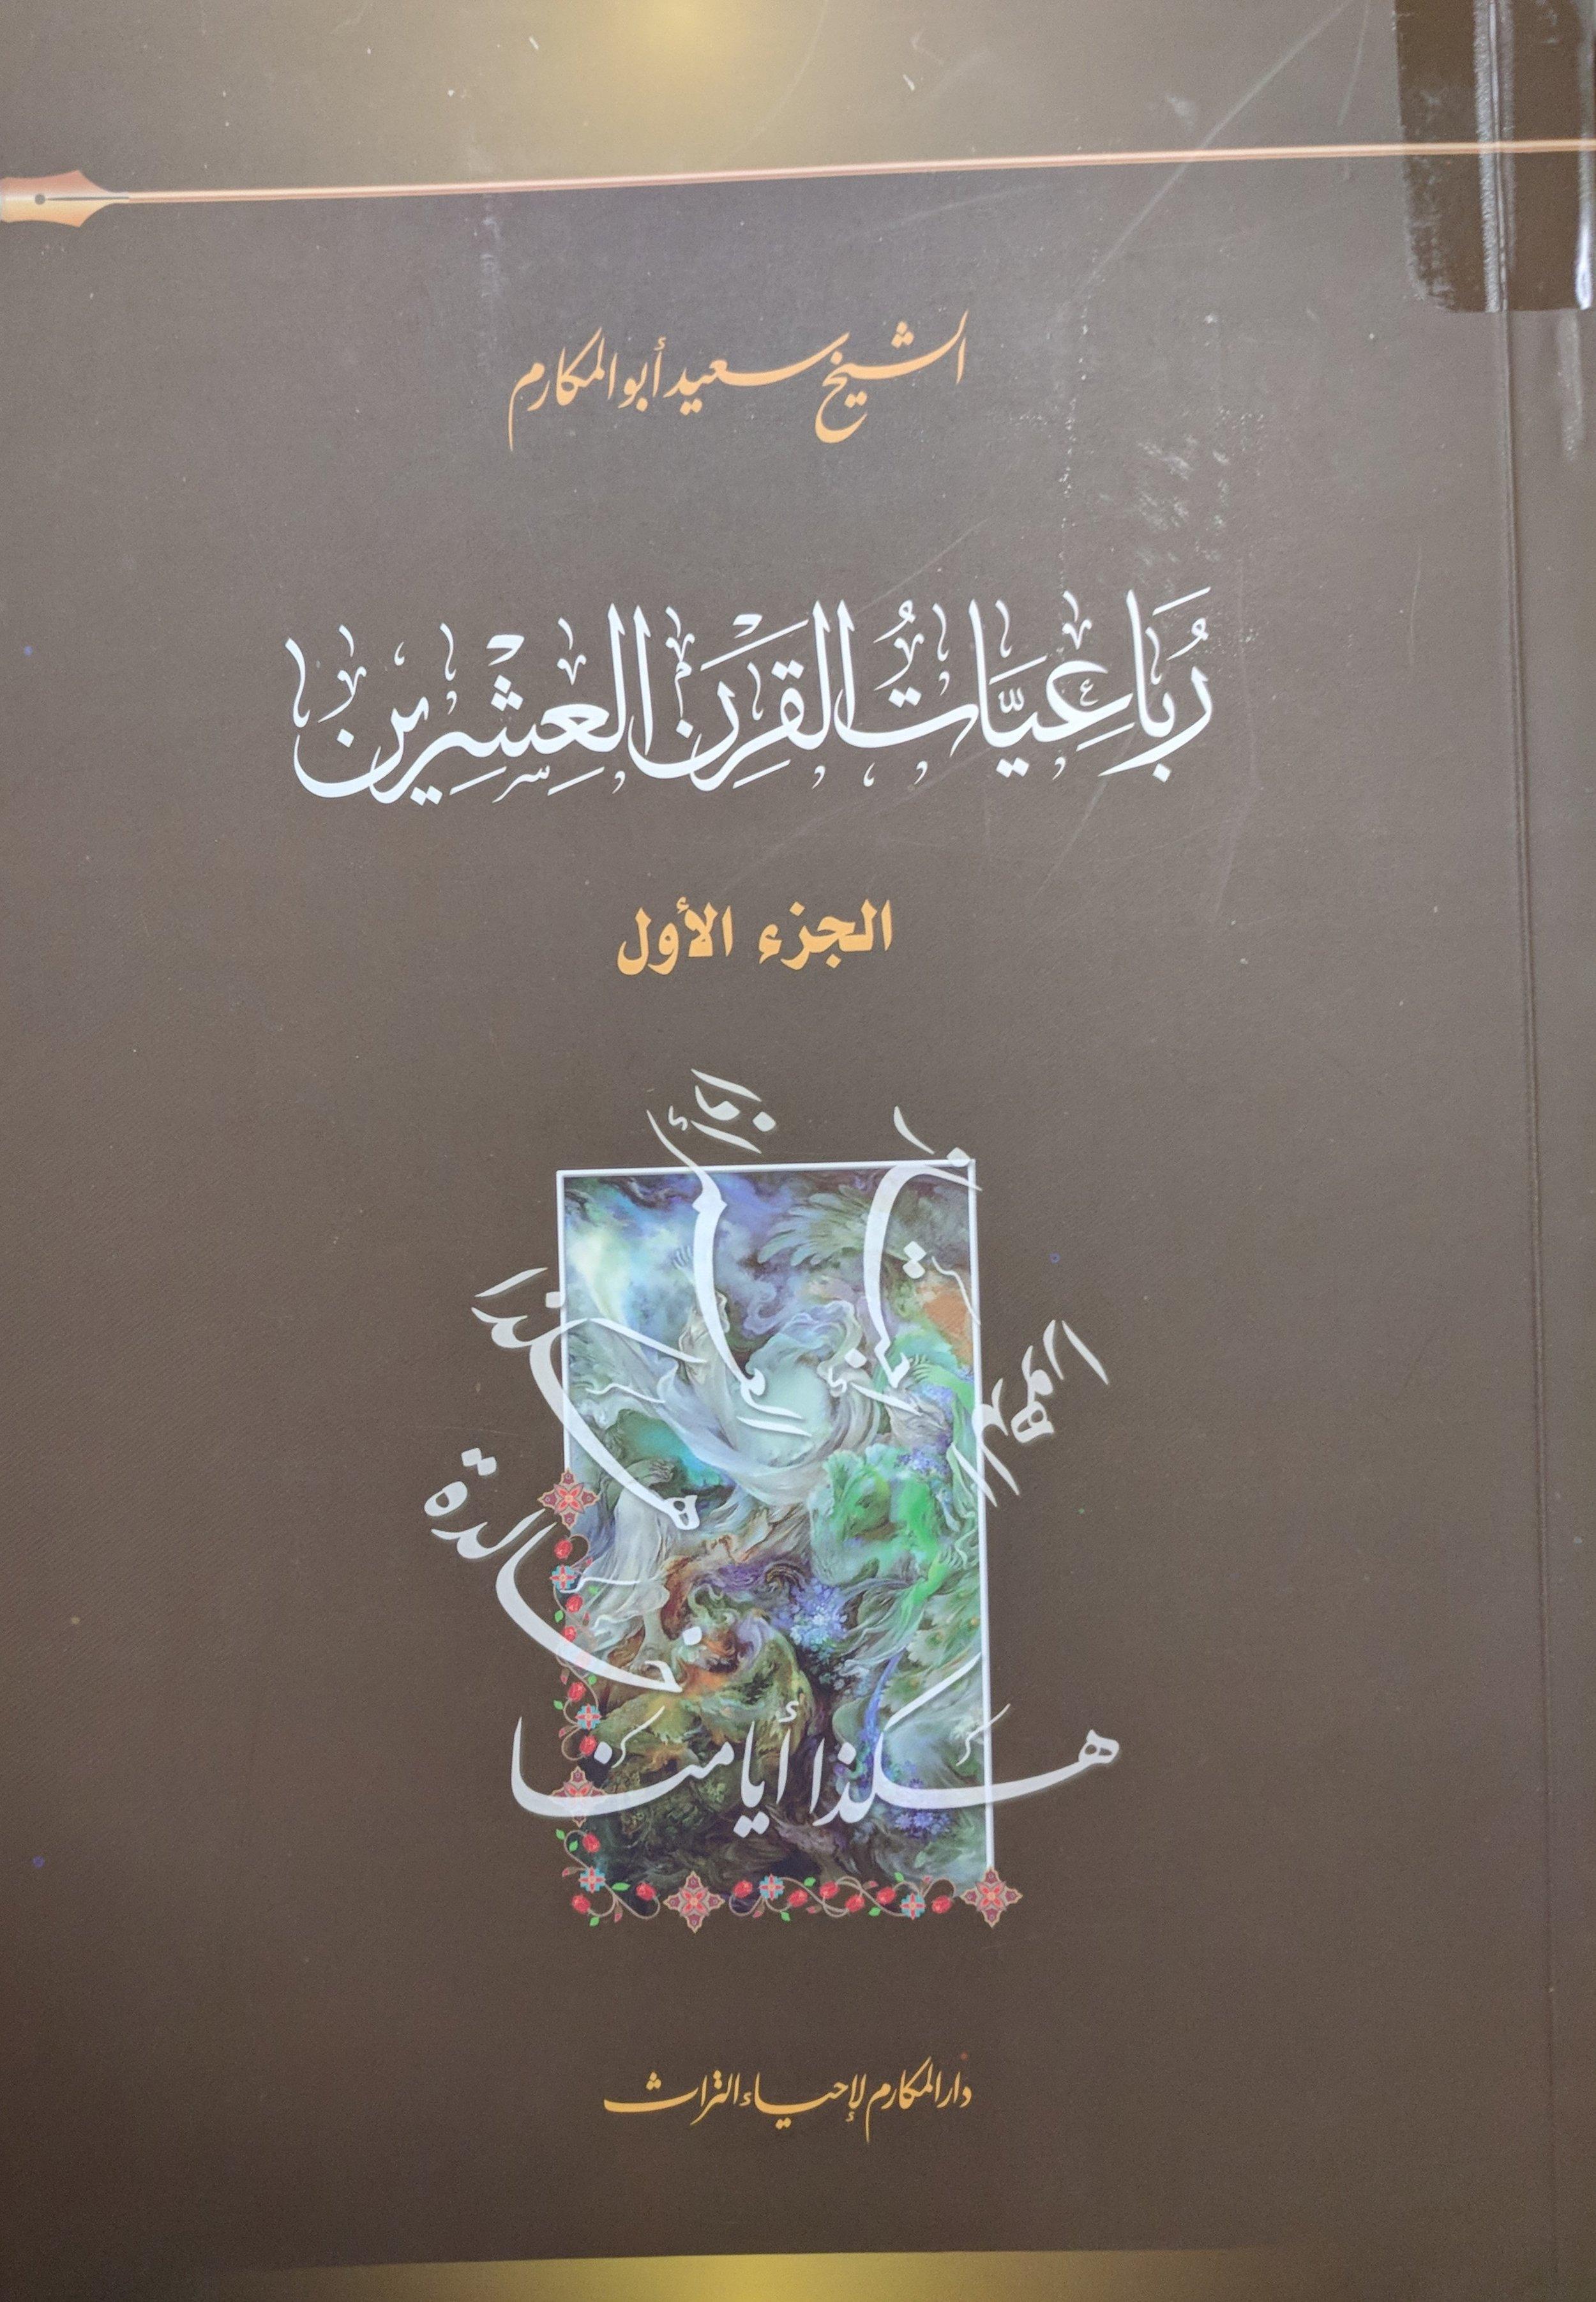 Saʻīd Abū al-Makārim, Rubāʻiyāt al-qarn al-ʻishrīn  (Bayrūt: Dār al-Makārim li-Iḥyā' al-Turāth, 2007)